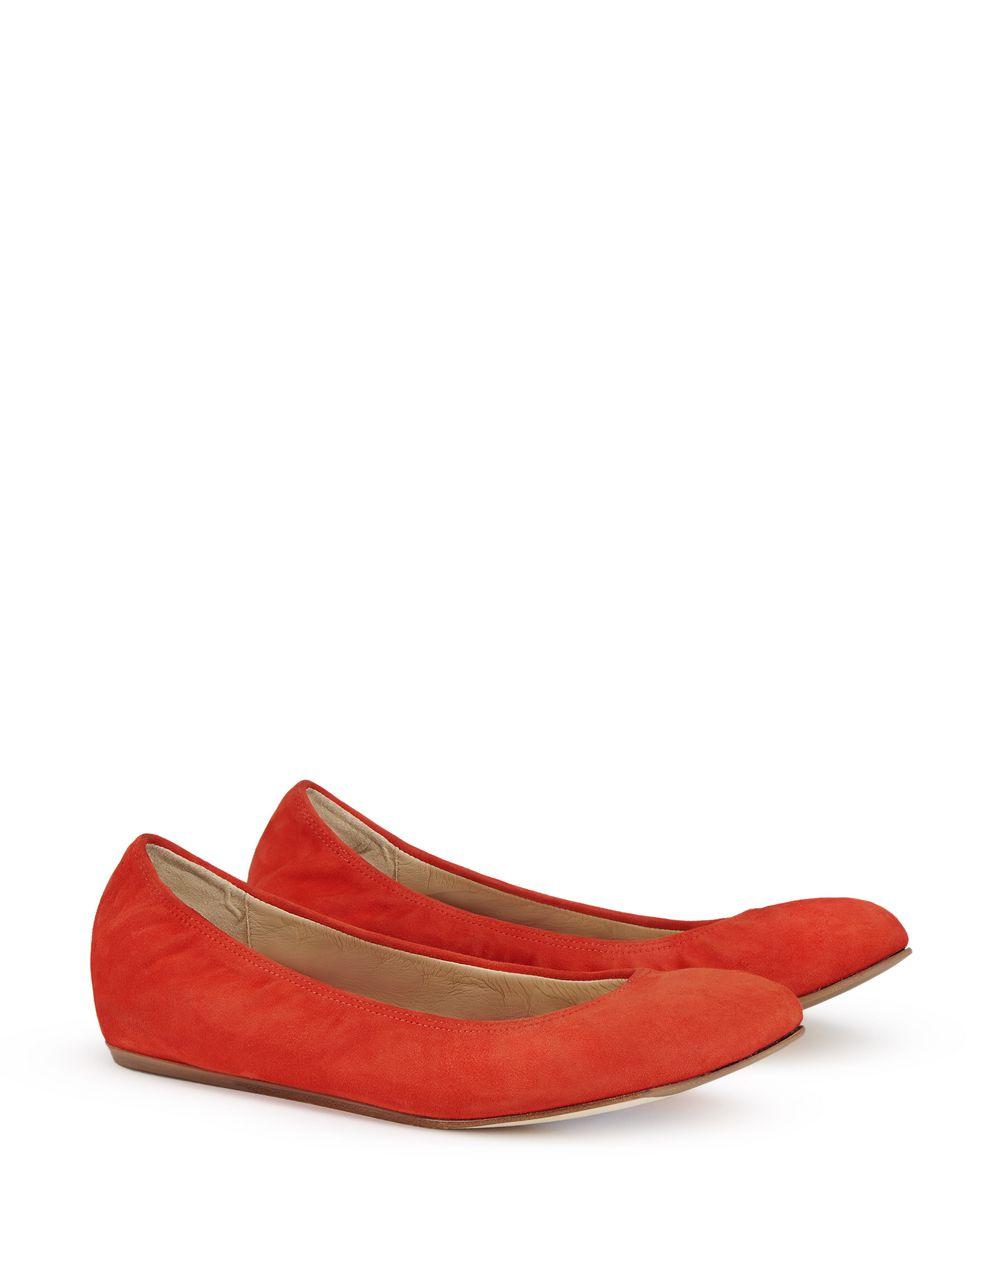 CLASSIC POPPY BALLET FLAT - Lanvin